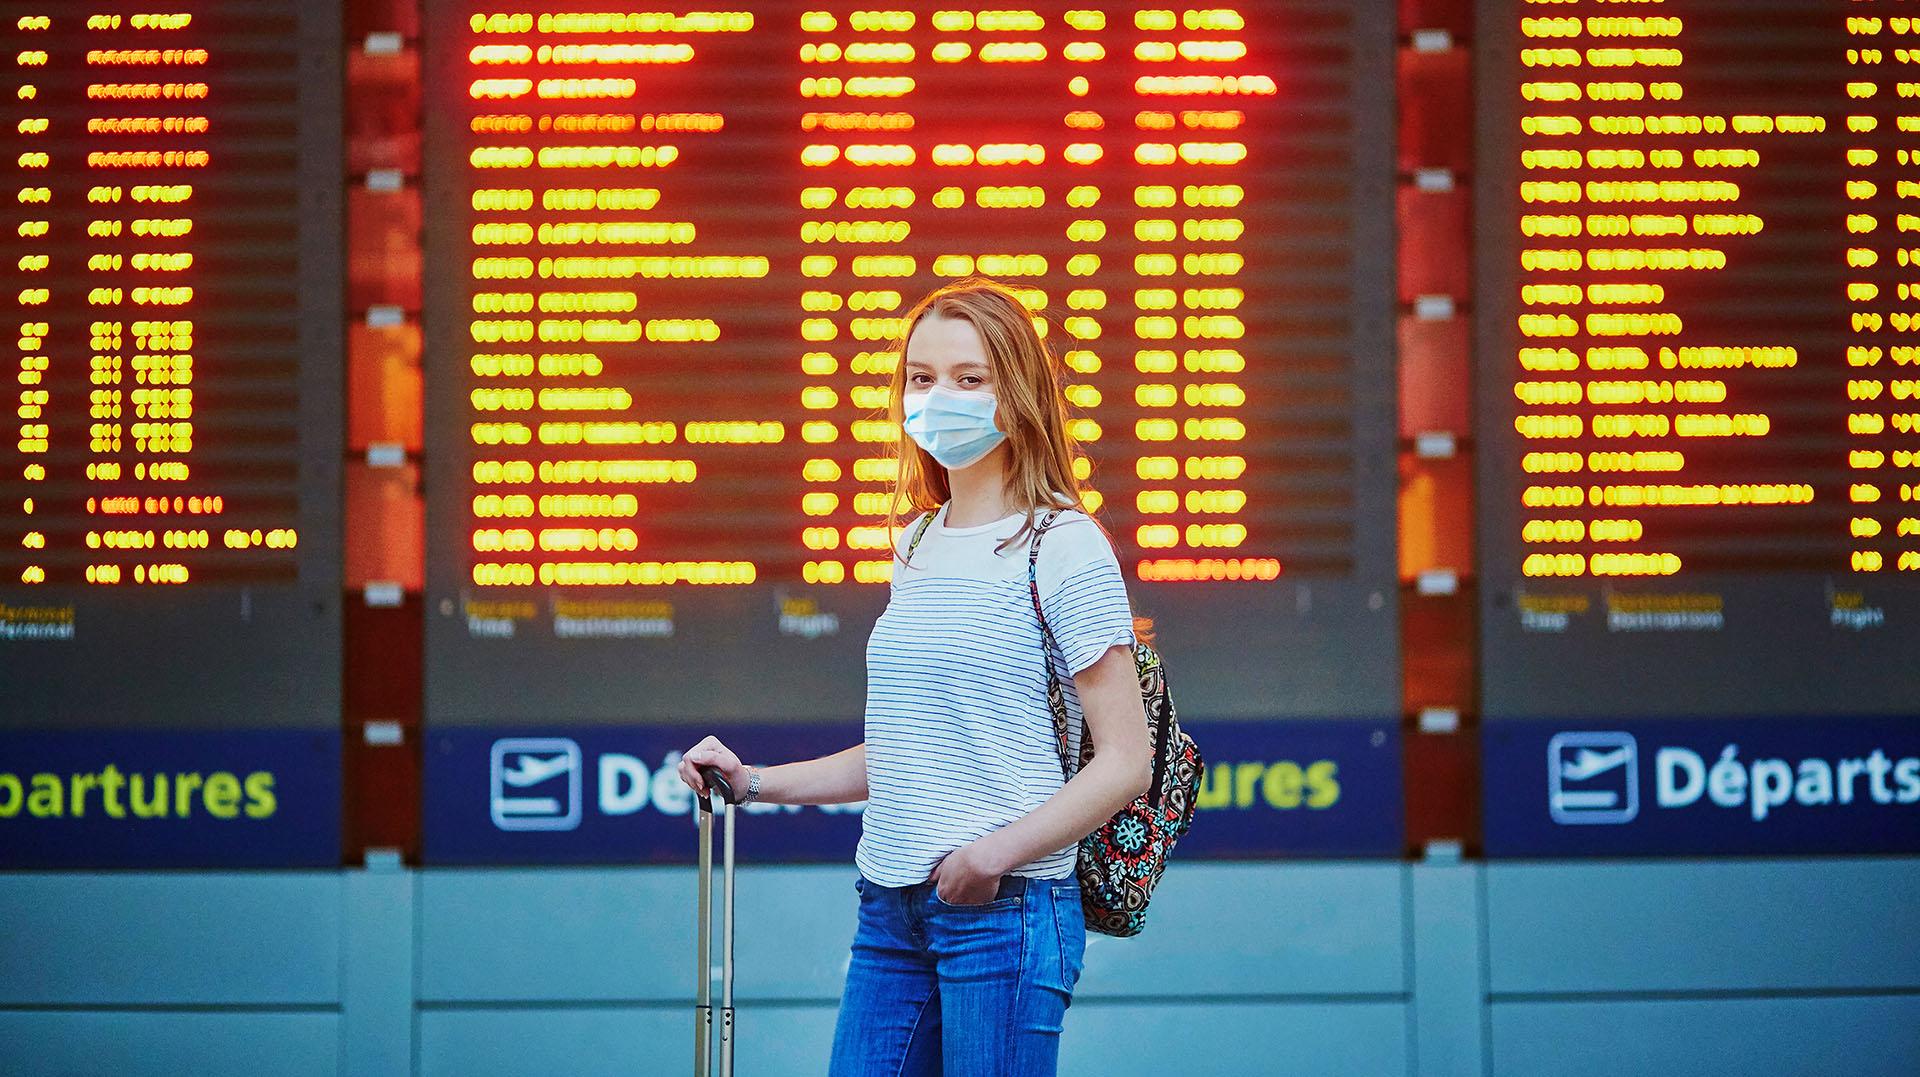 Covid-19 και τουρισμός 2021: τι ισχύει σήμερα